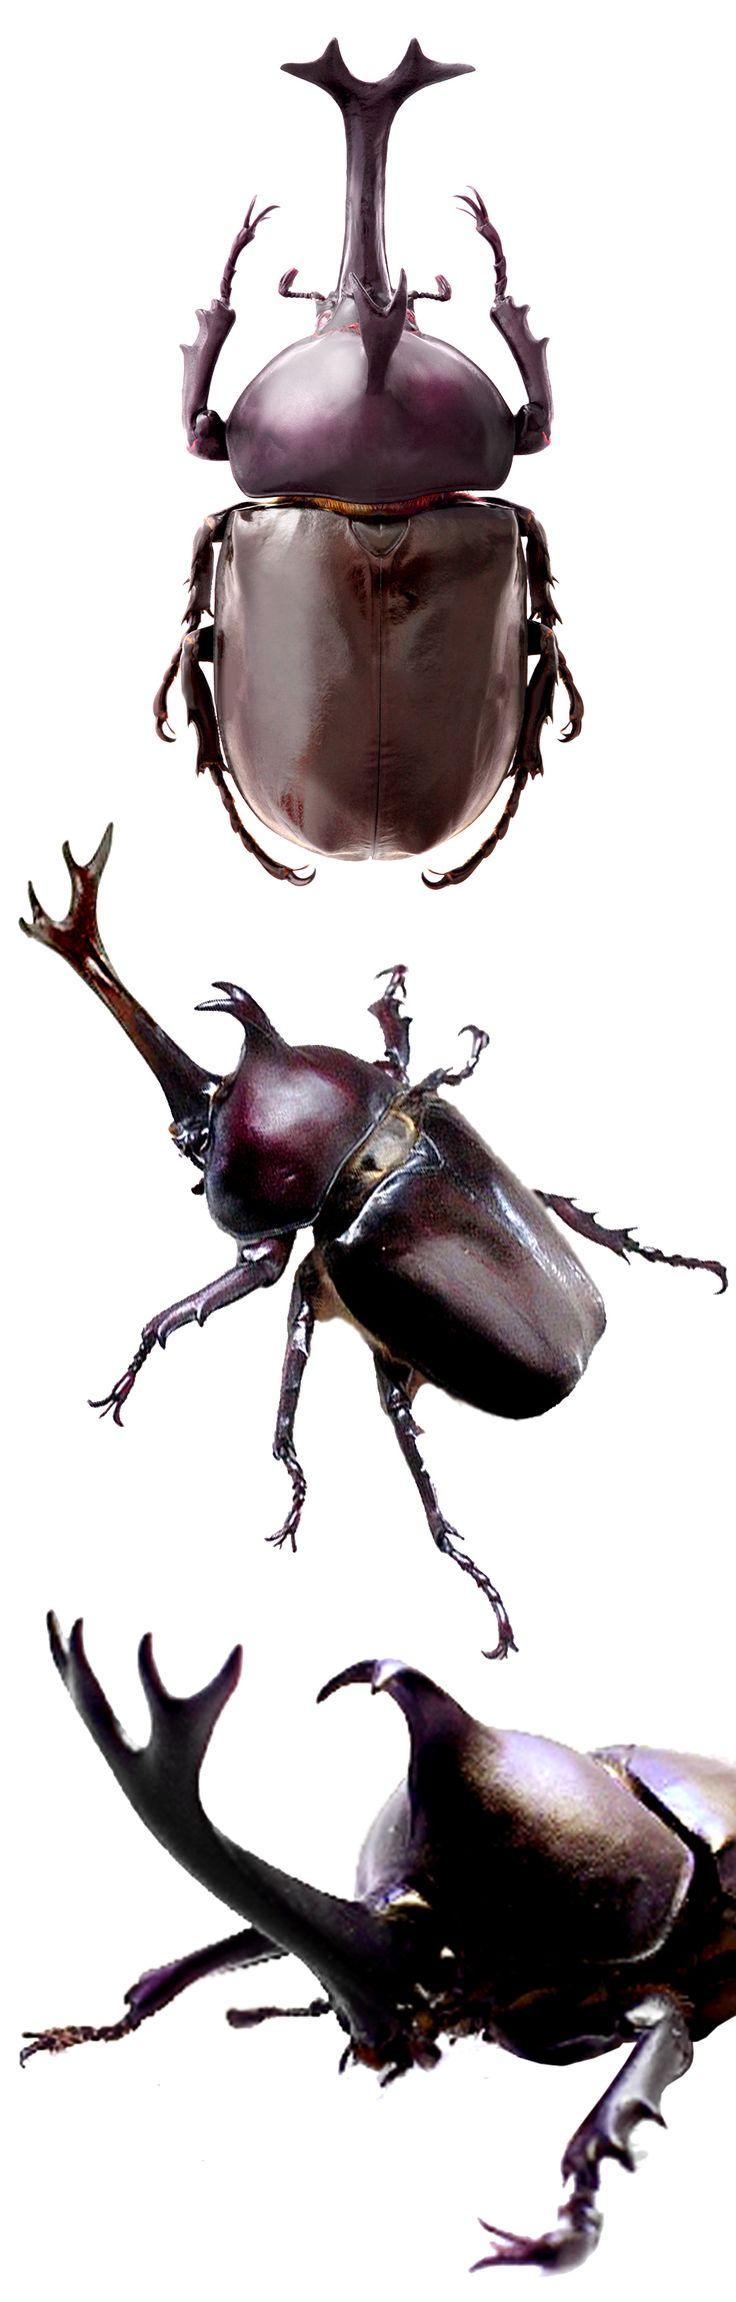 HEXAPODA (Hexápode) - Classe Insecta.  /   HEXAPODA (Hexapod) - Class Insecta.  Allomyrina dichotoma